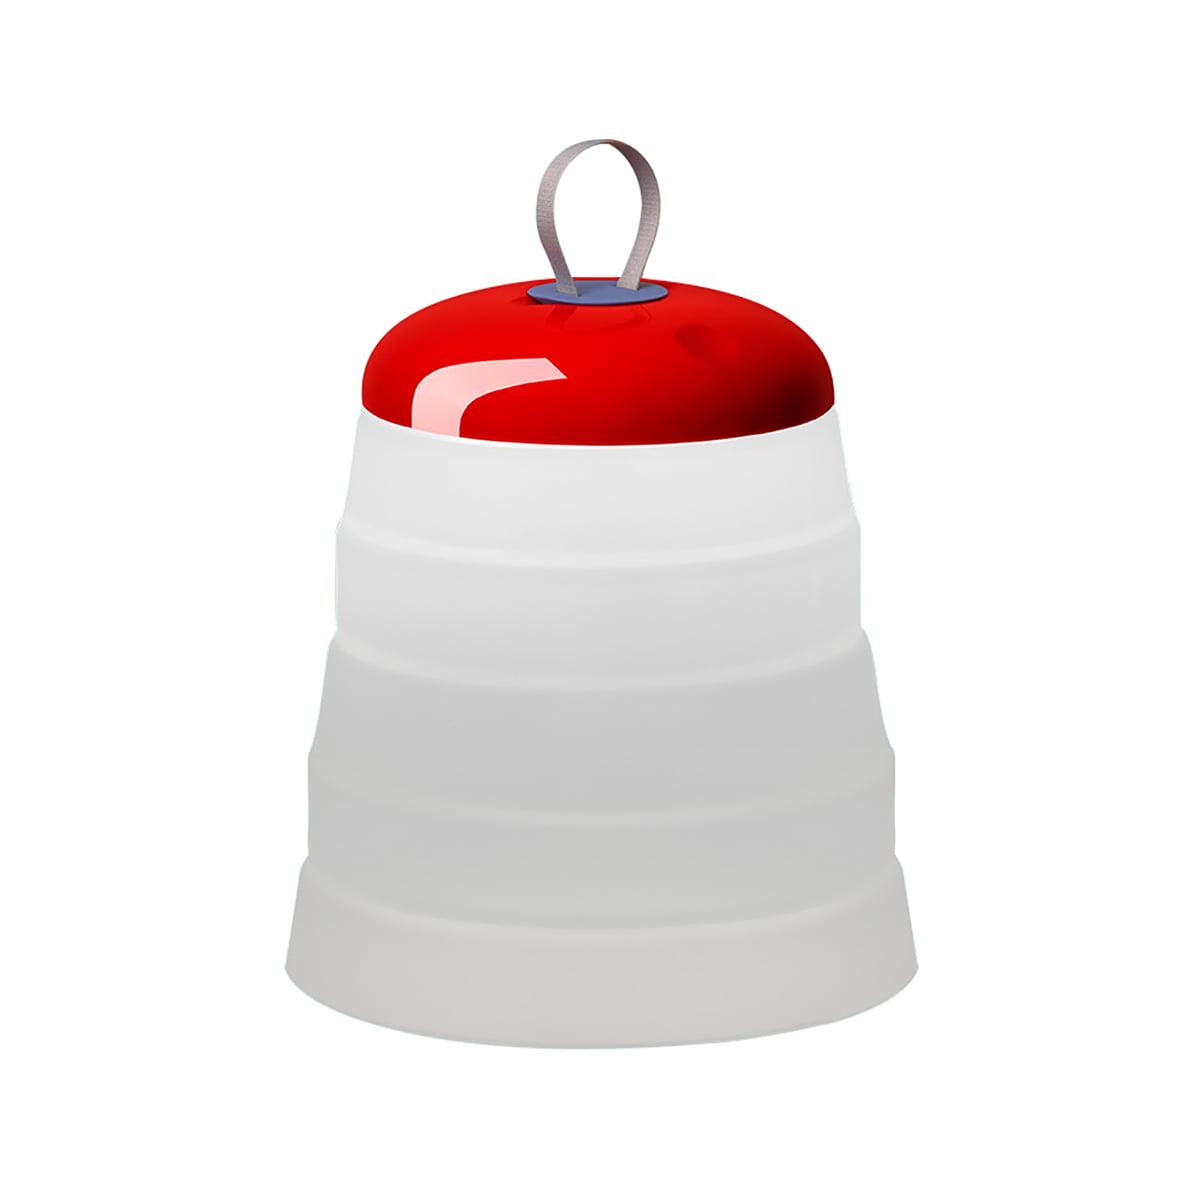 CriRouge Lampe Cri Batterie Foscarini À Led Aq5cR34Lj